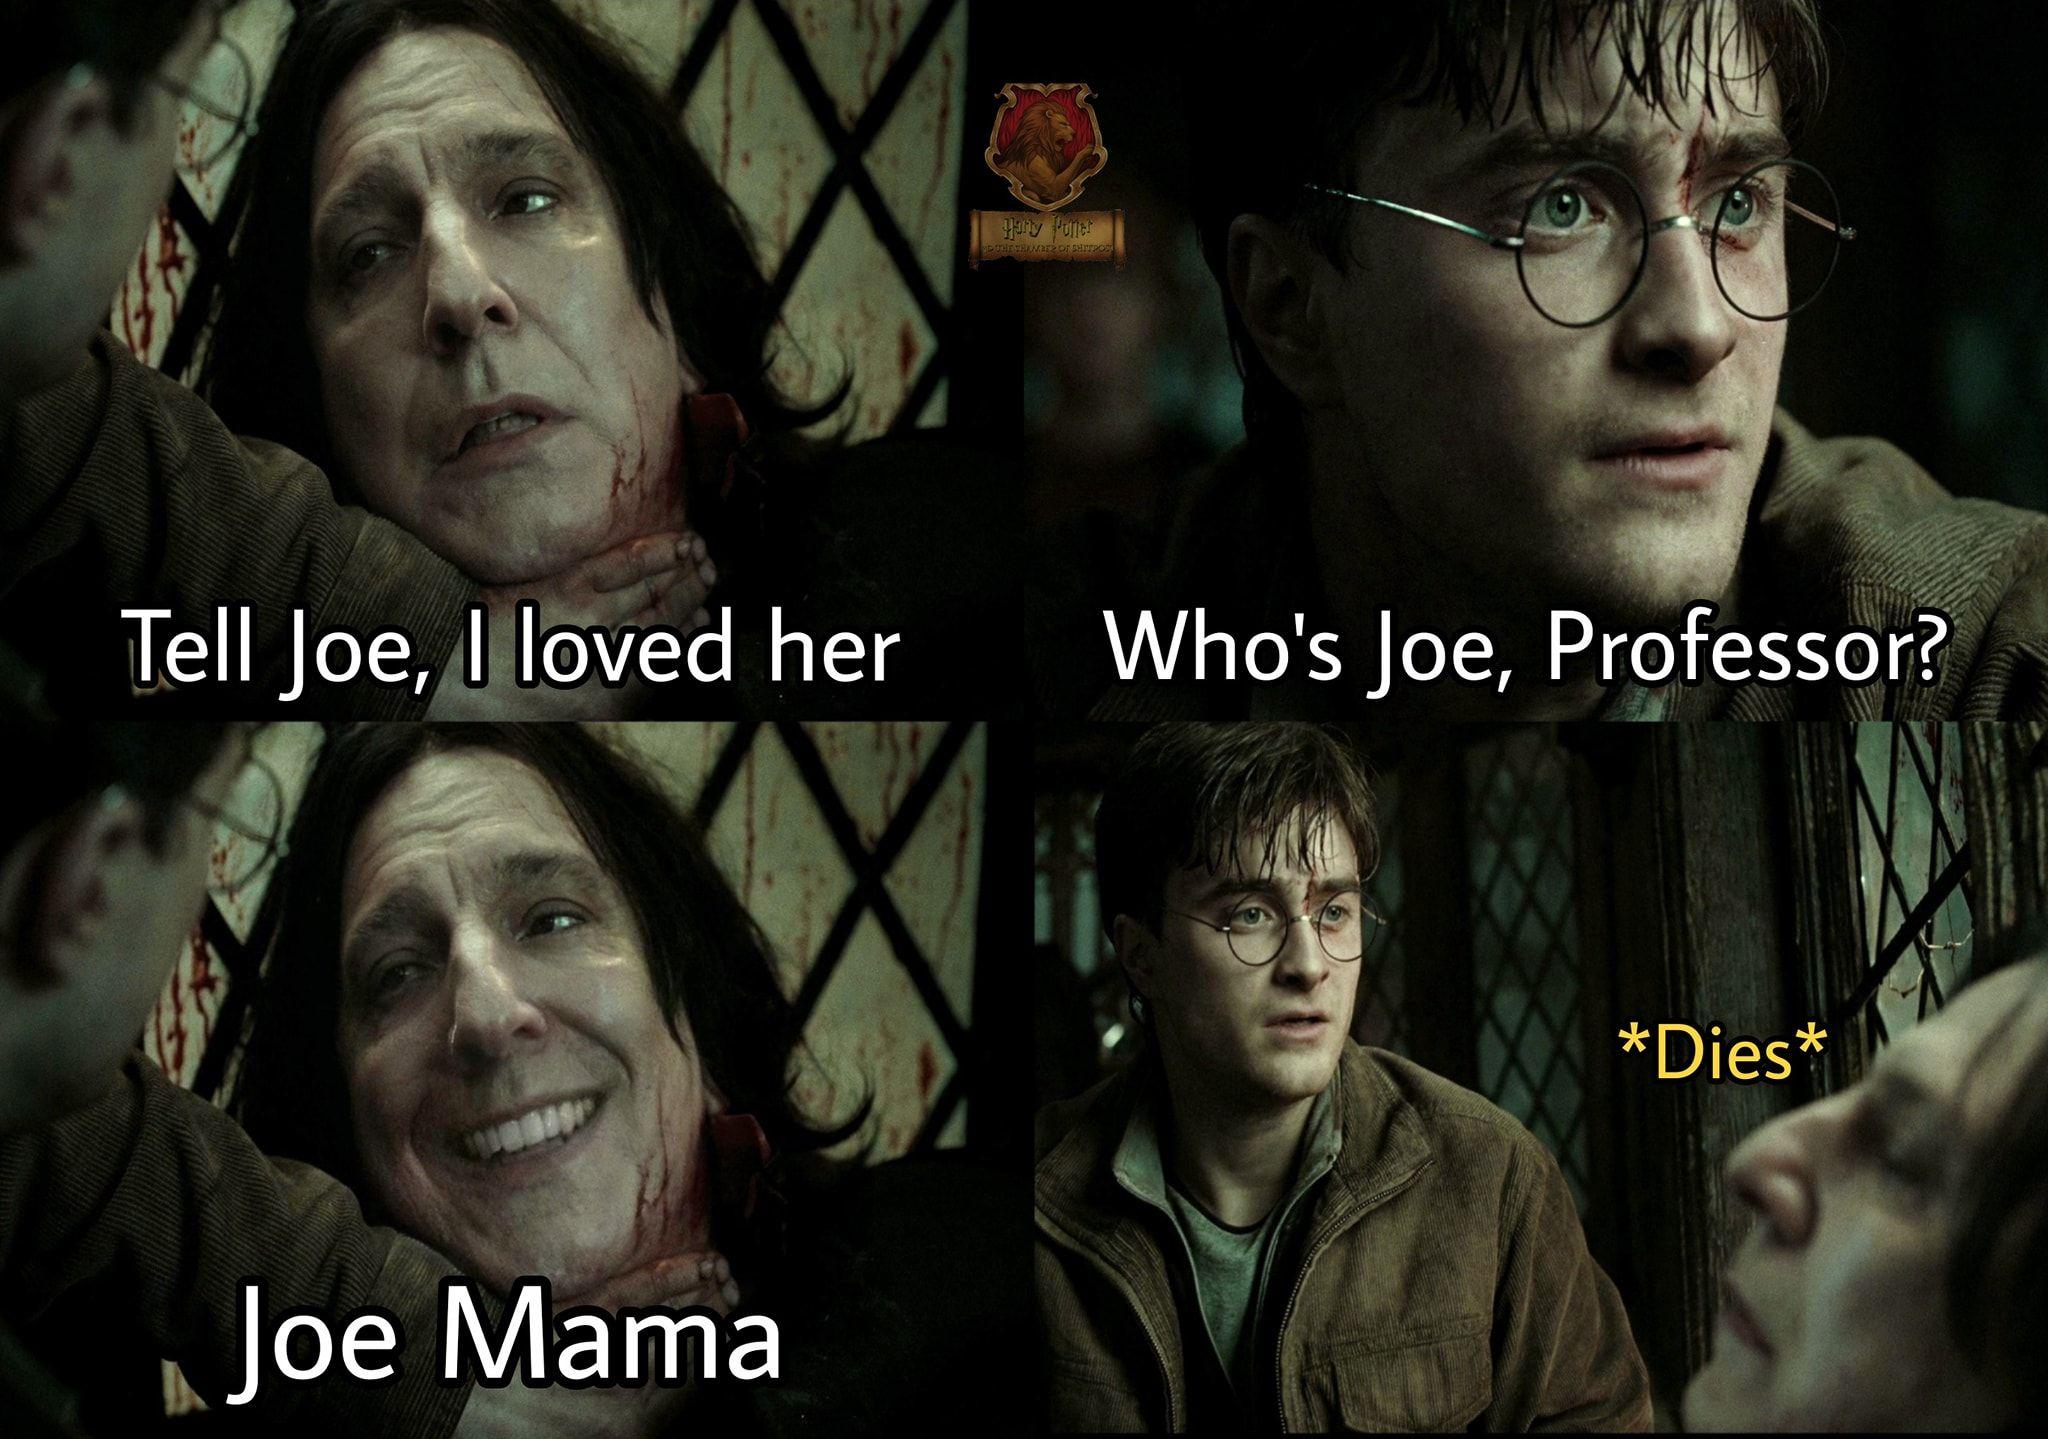 Pin By Gigimora On The Good Eggs Harry Potter Memes Hilarious Harry Potter Jokes Really Funny Memes